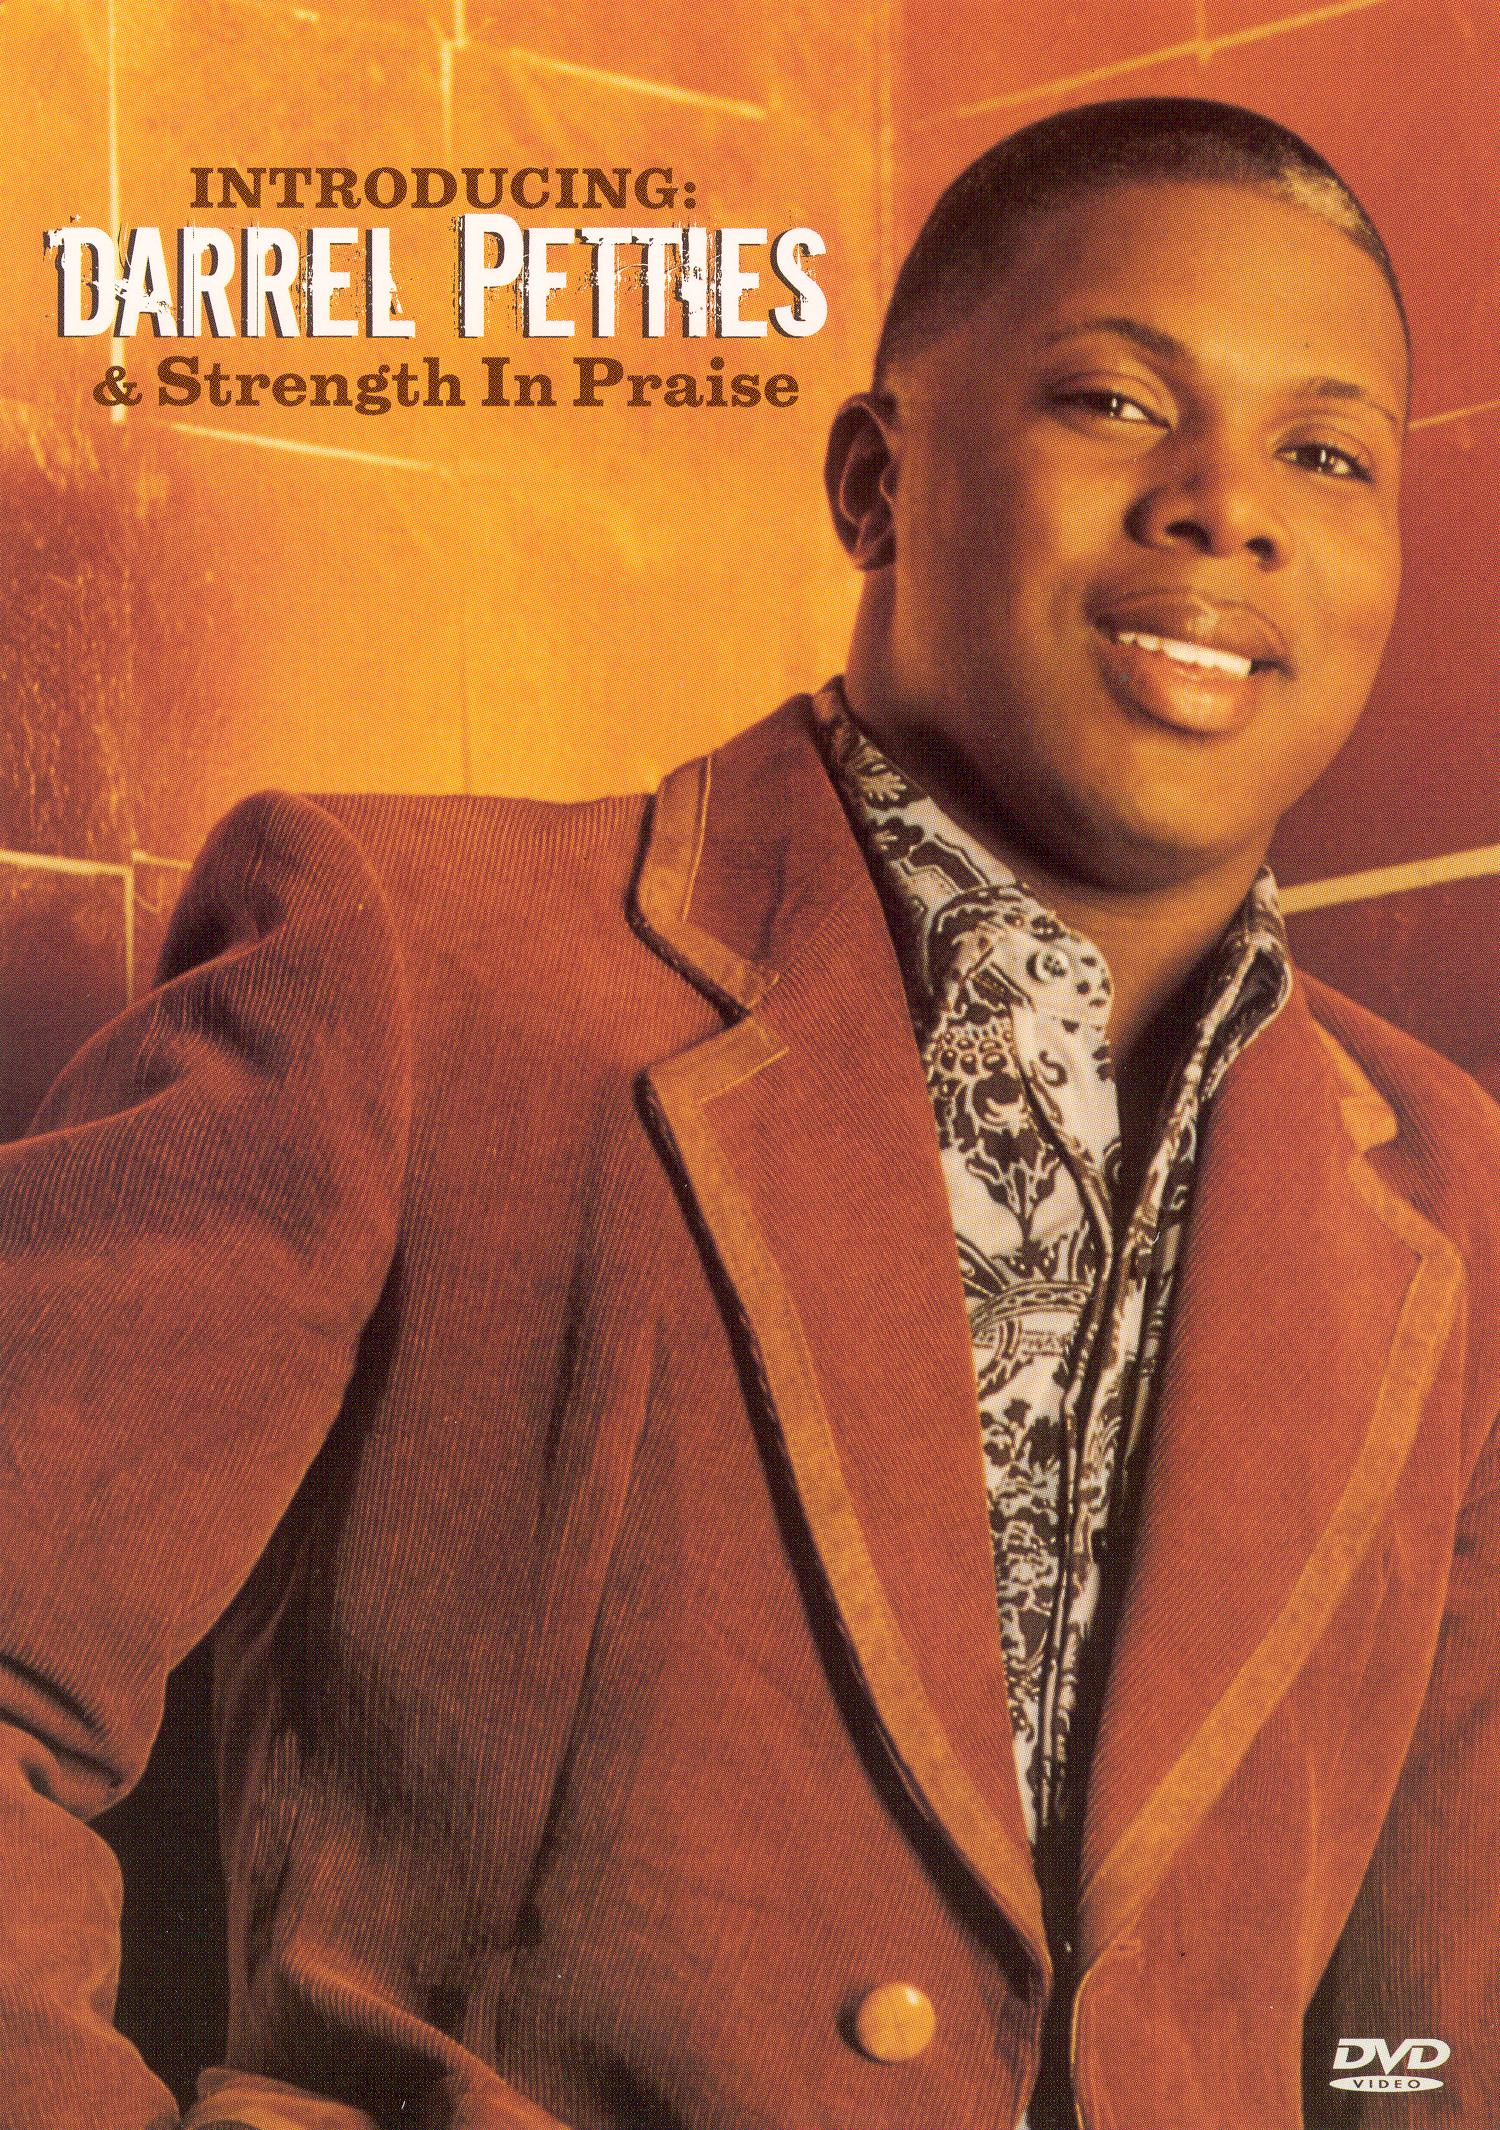 Darrel Petties & Strength In Praise: Introducing Darrel Petties